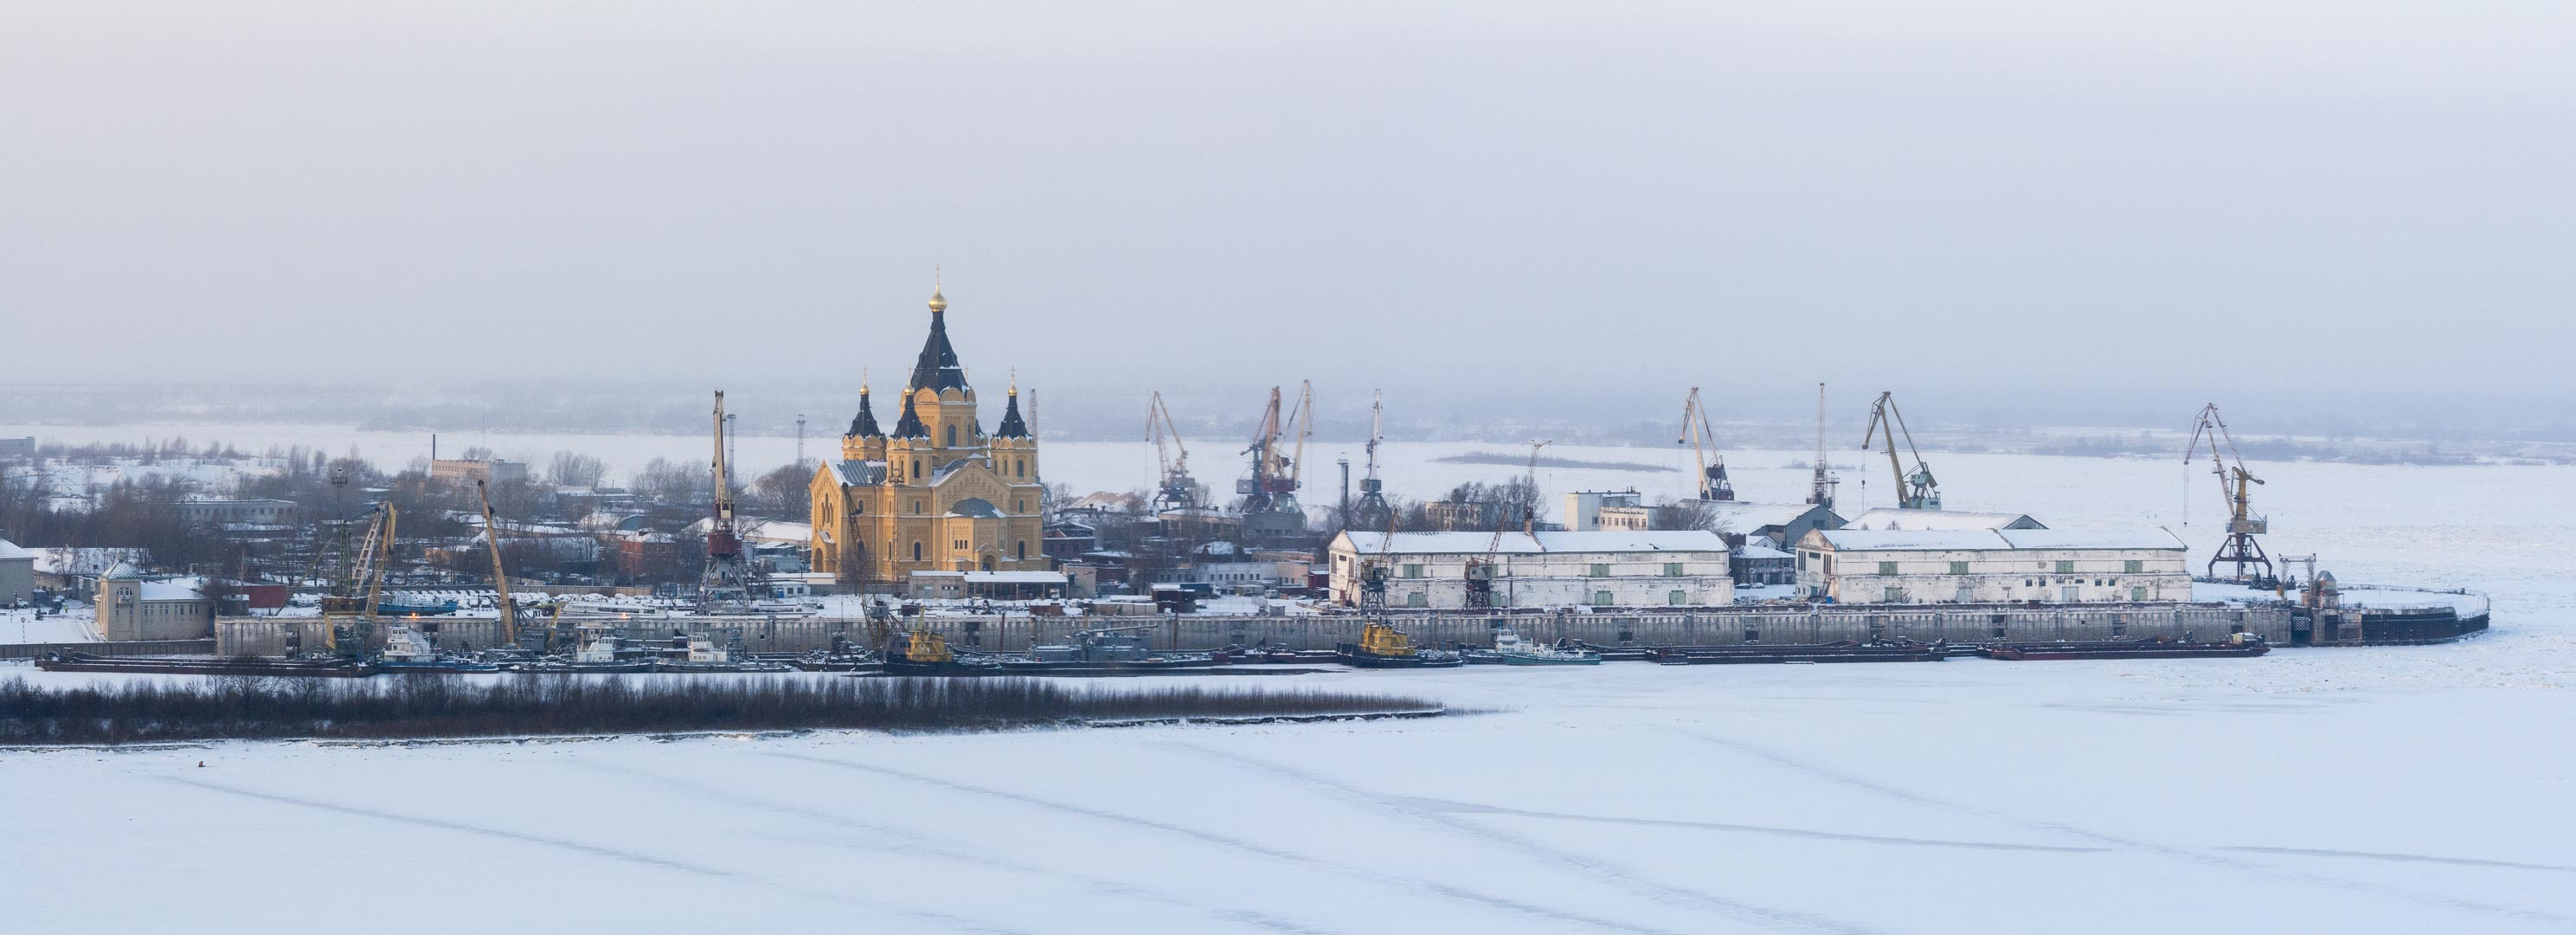 Alexander Nevsky Cathedral, Nizhny Novgorod – Russia